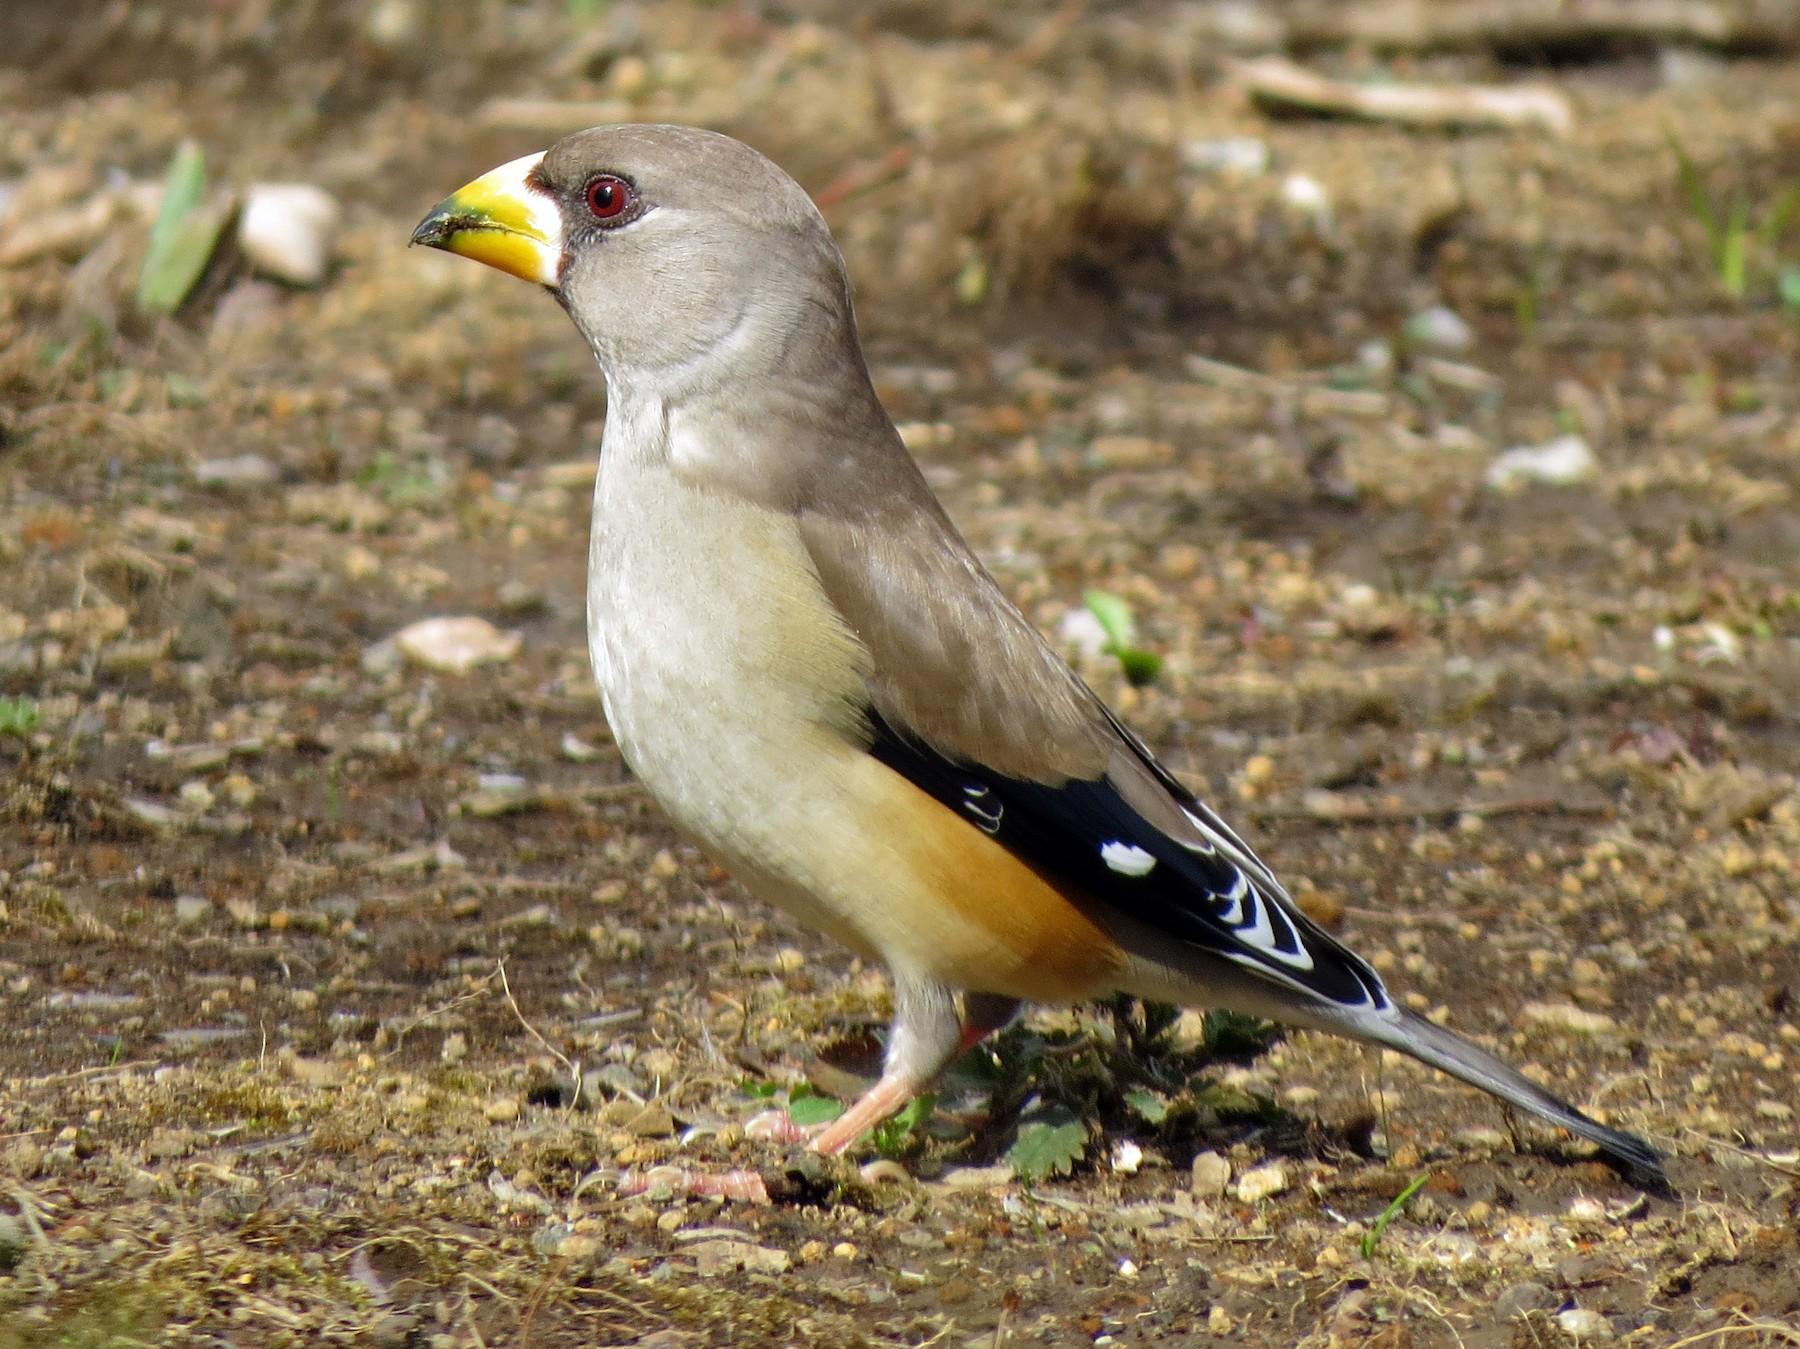 Yellow-billed Grosbeak - German Pugnali